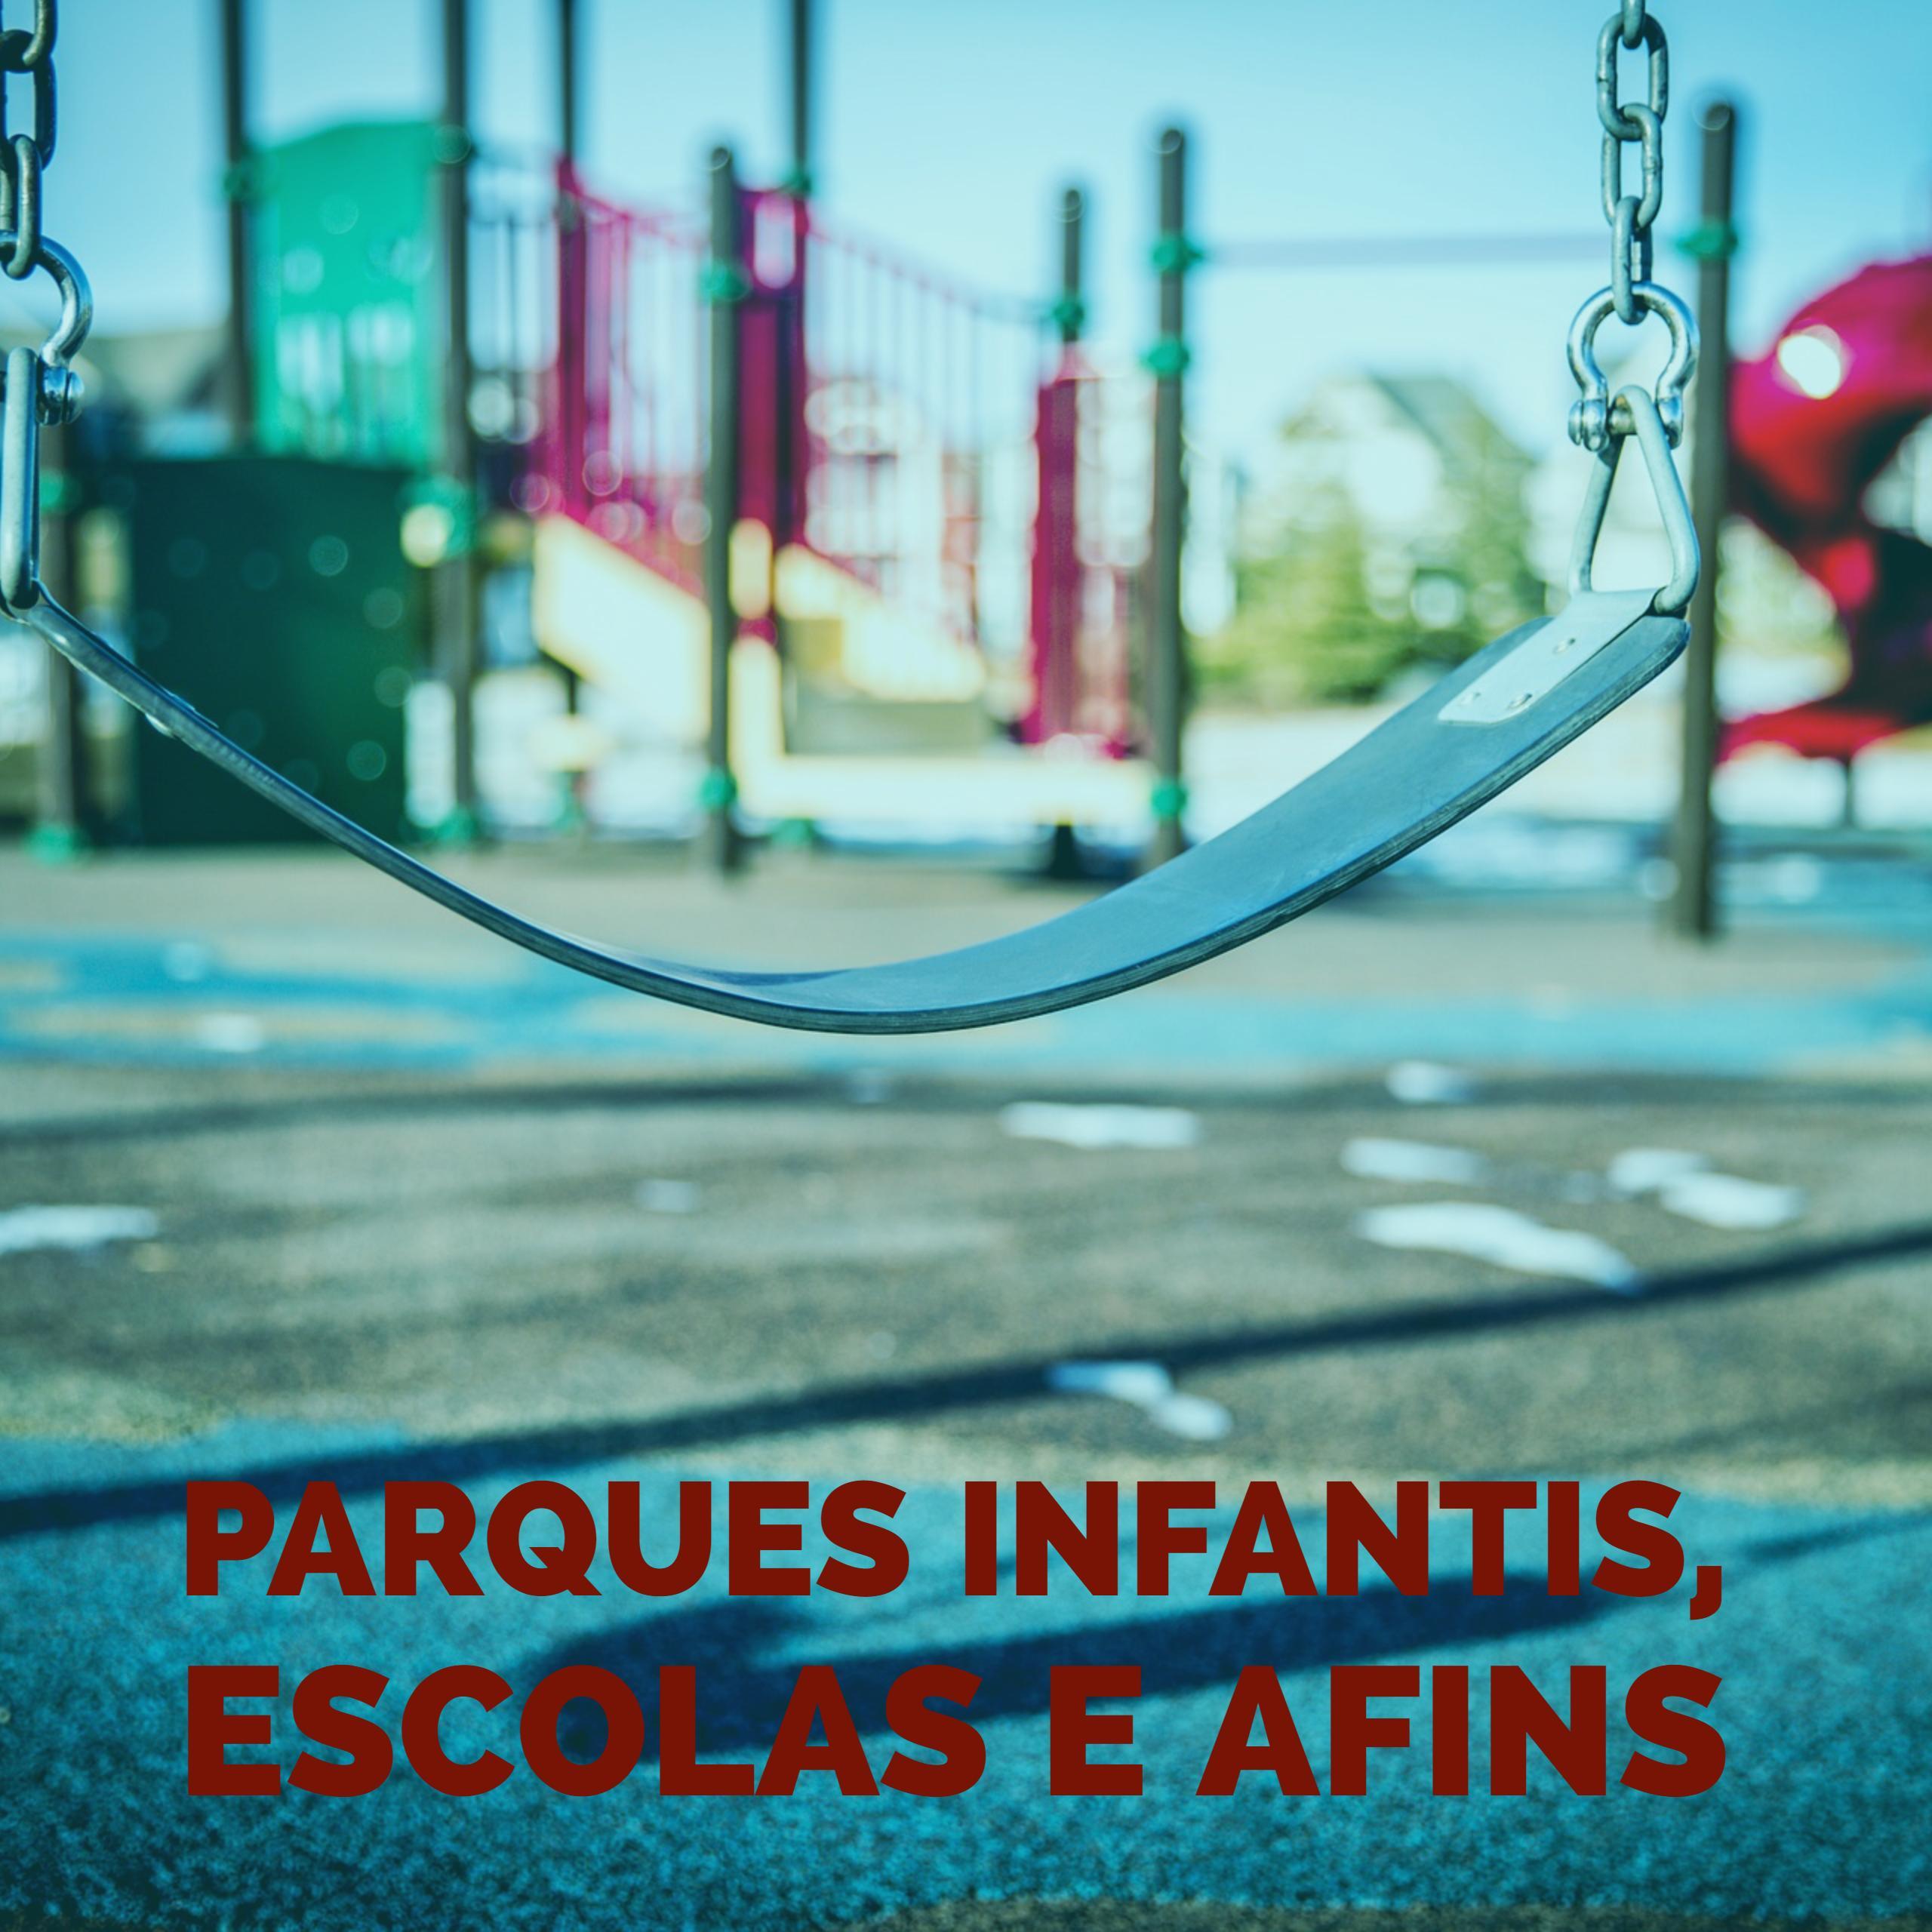 Parques Infantis, Escolas e Afins